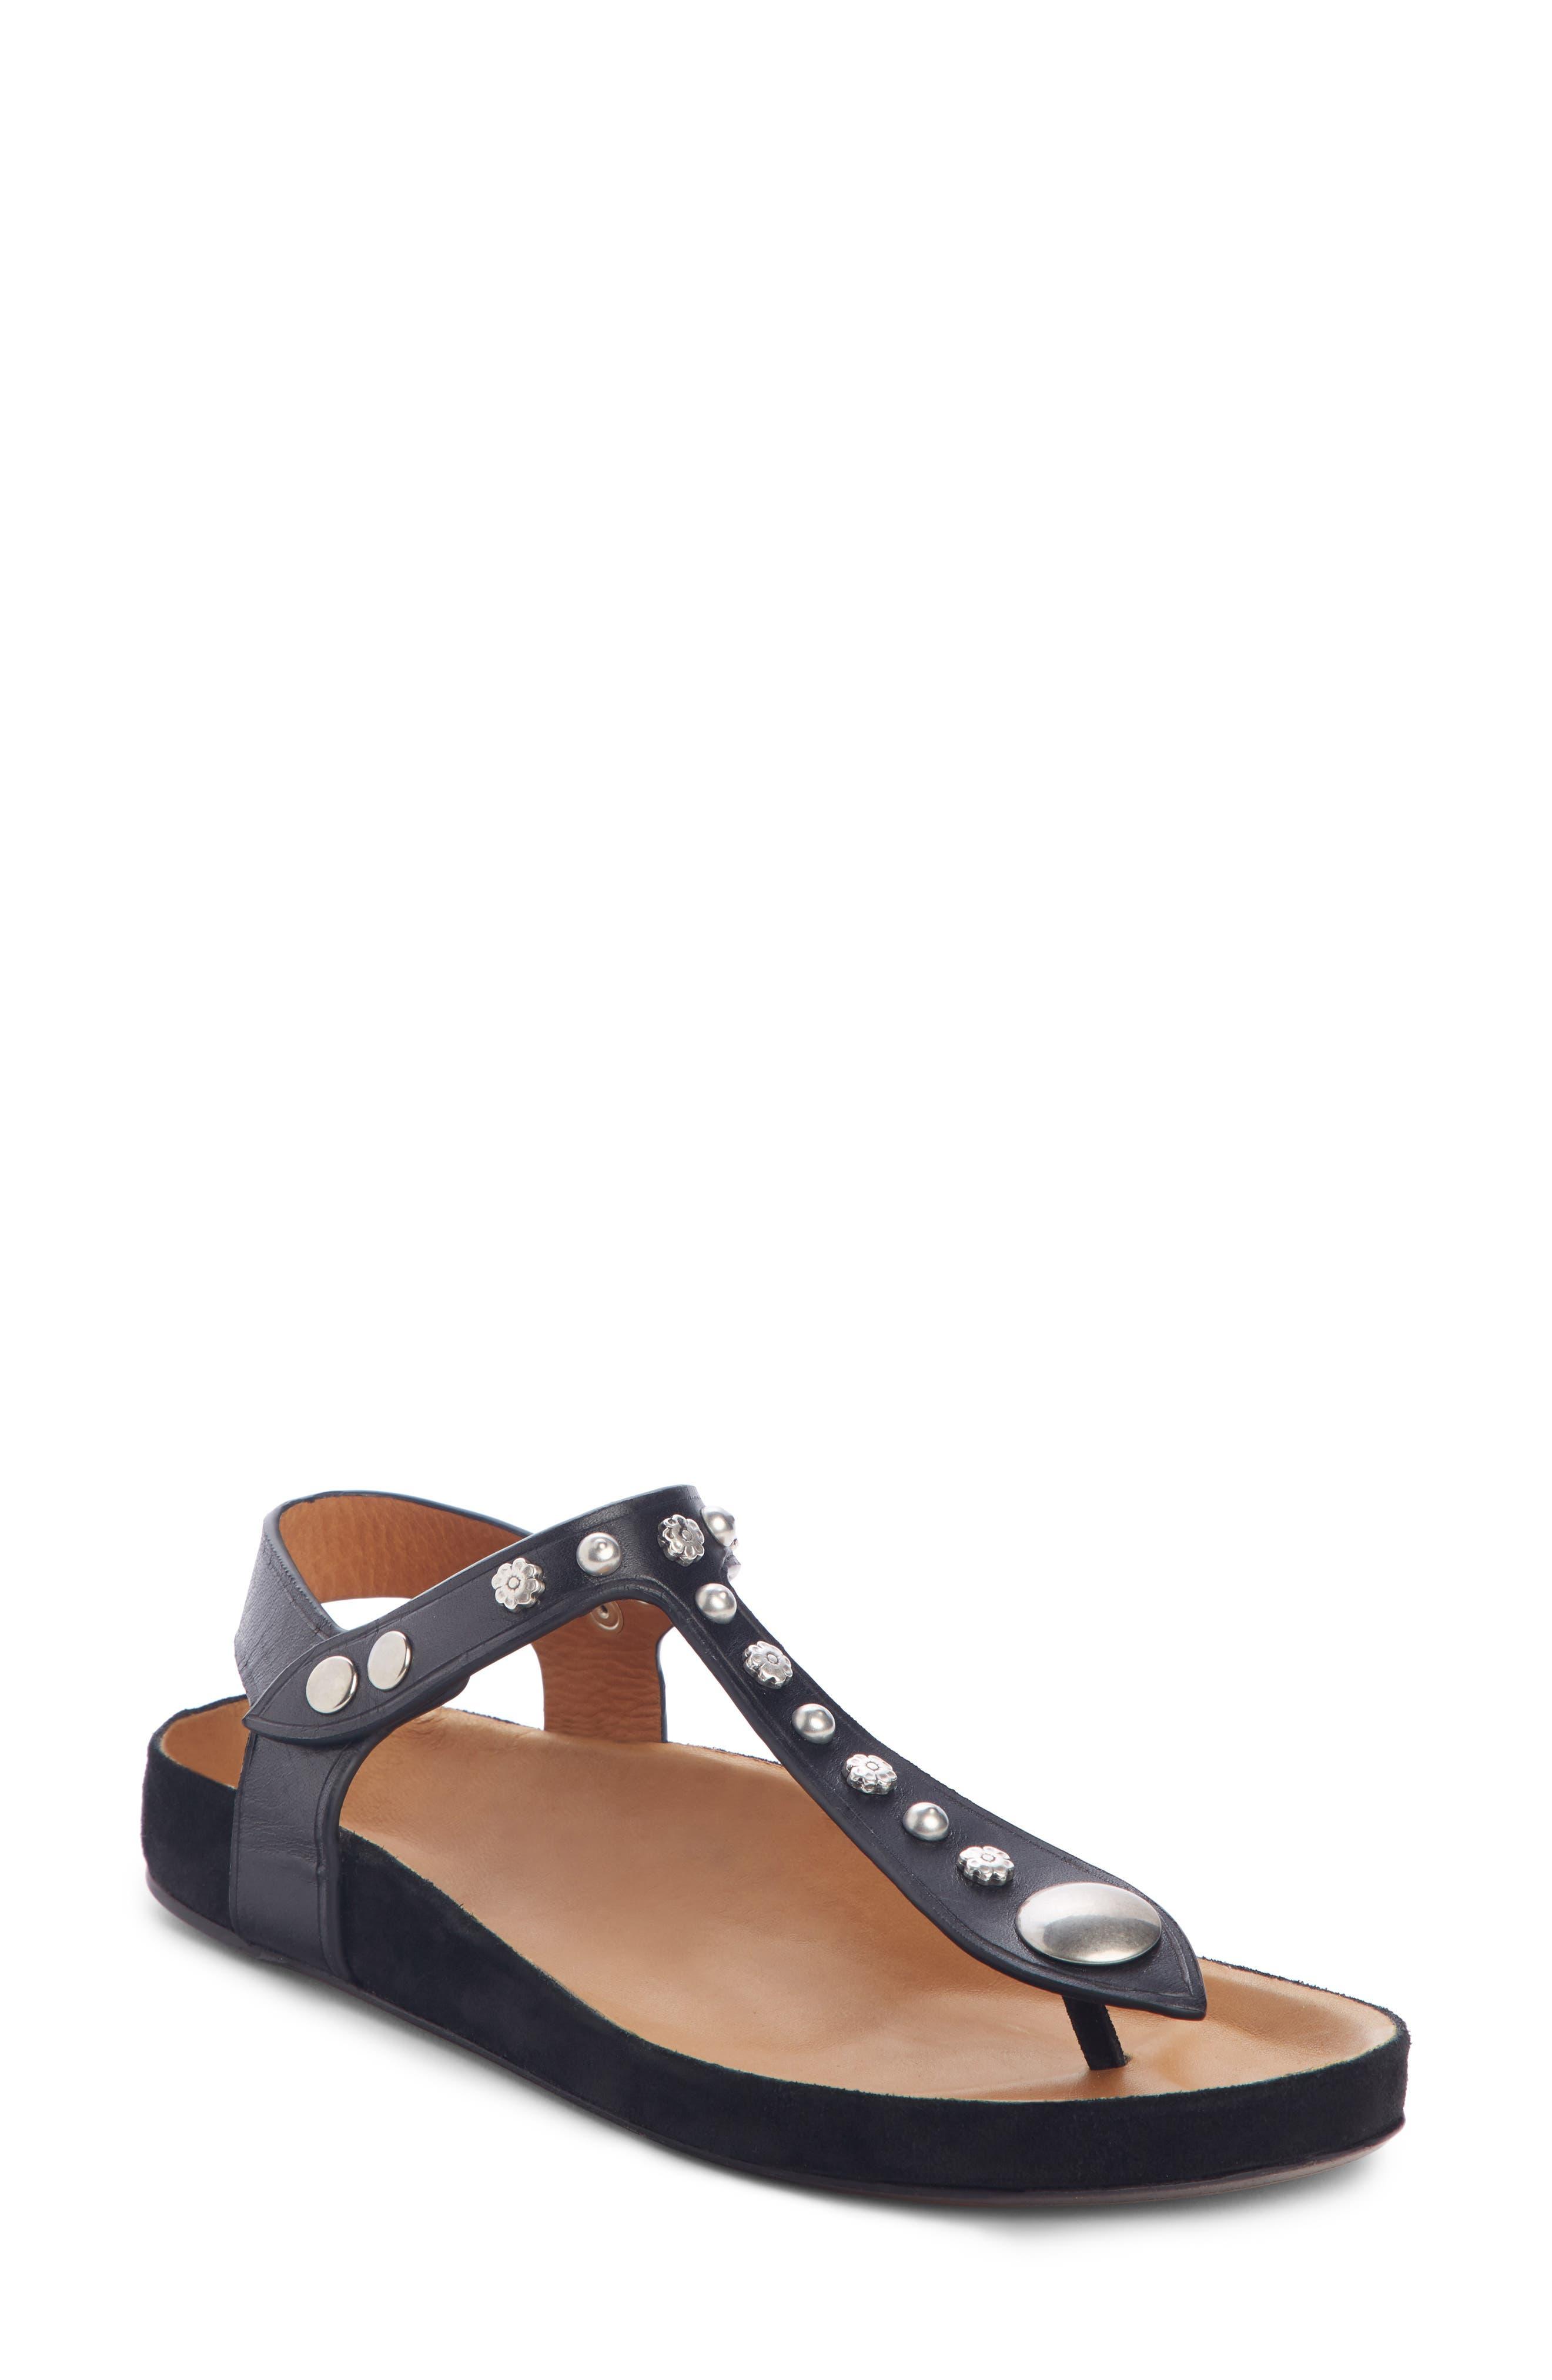 Enore Studded Sandal,                             Main thumbnail 1, color,                             BLACK